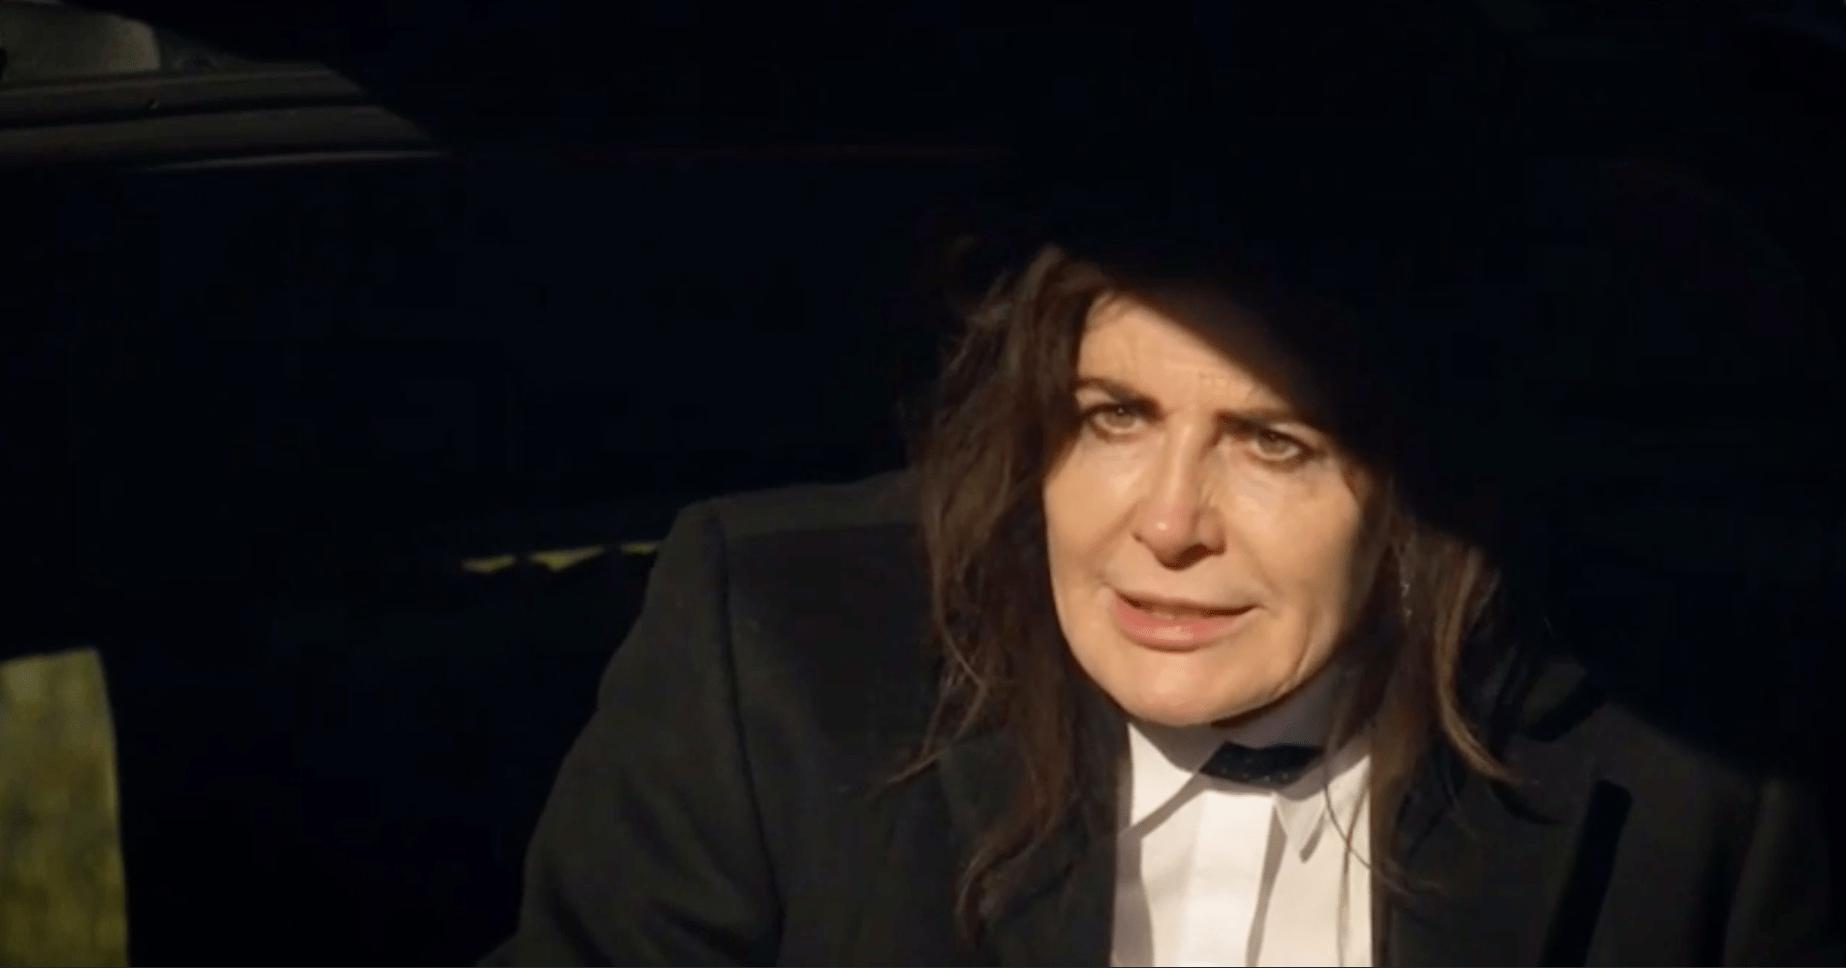 Emmerdale spoilers: New trailer reveals Faith Dingle's surprise return 'from the dead'